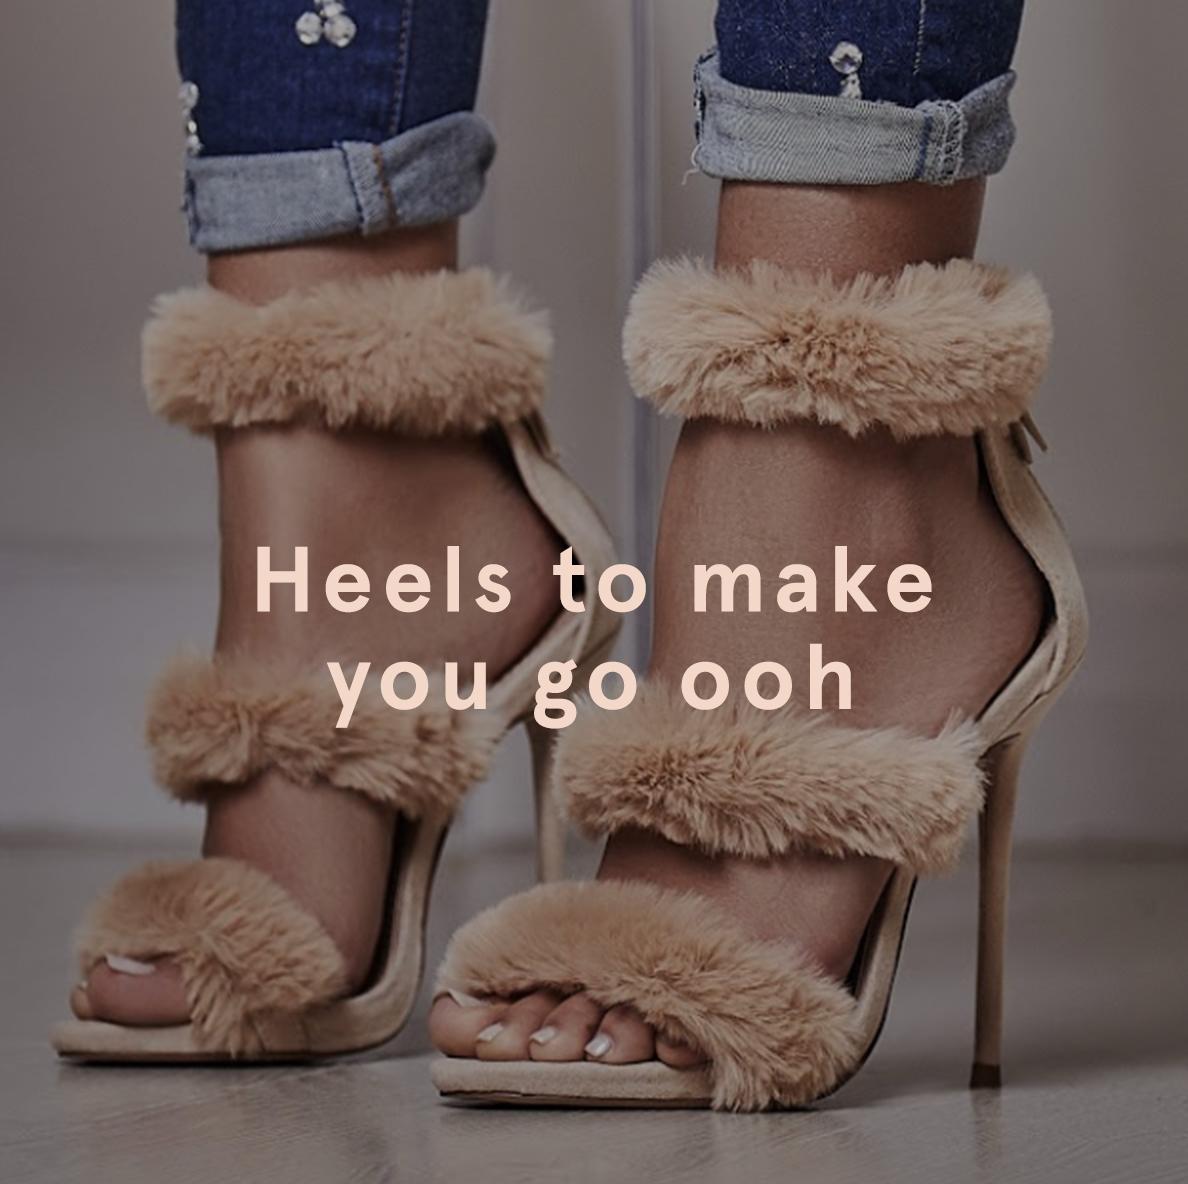 Heels to Make You Go Ooh Ego Hadea Fluffy Heel in Nude Faux Suede £34.99